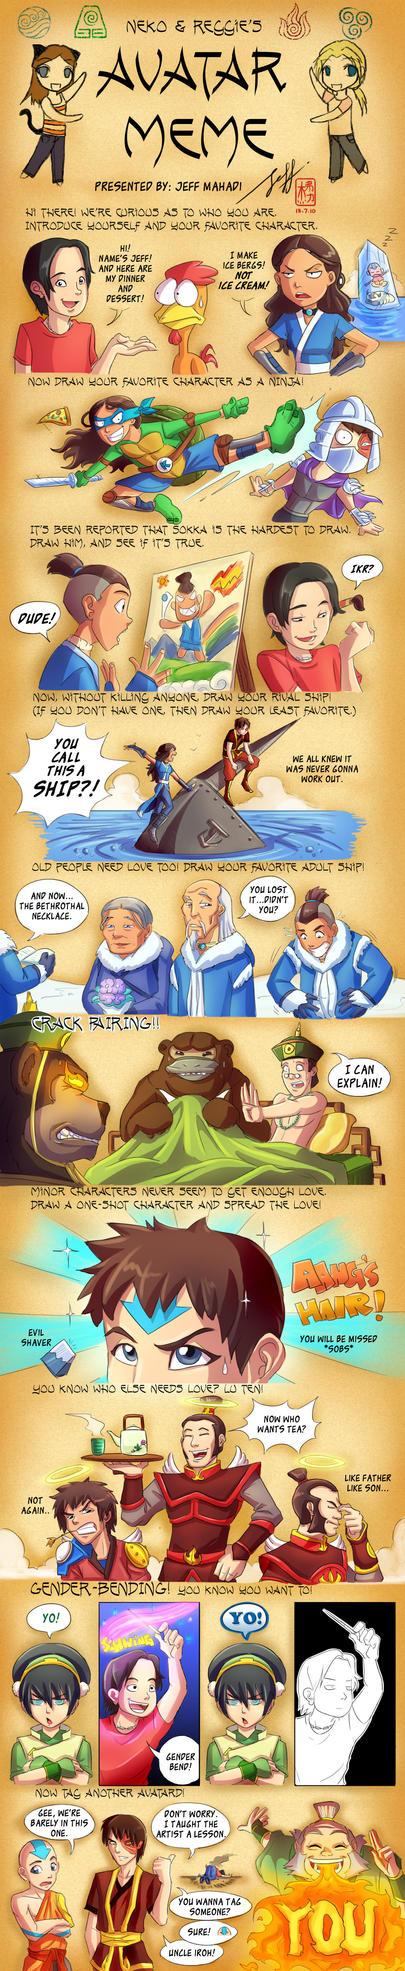 Avatar The Last Airbender Meme by Jeff-Mahadi